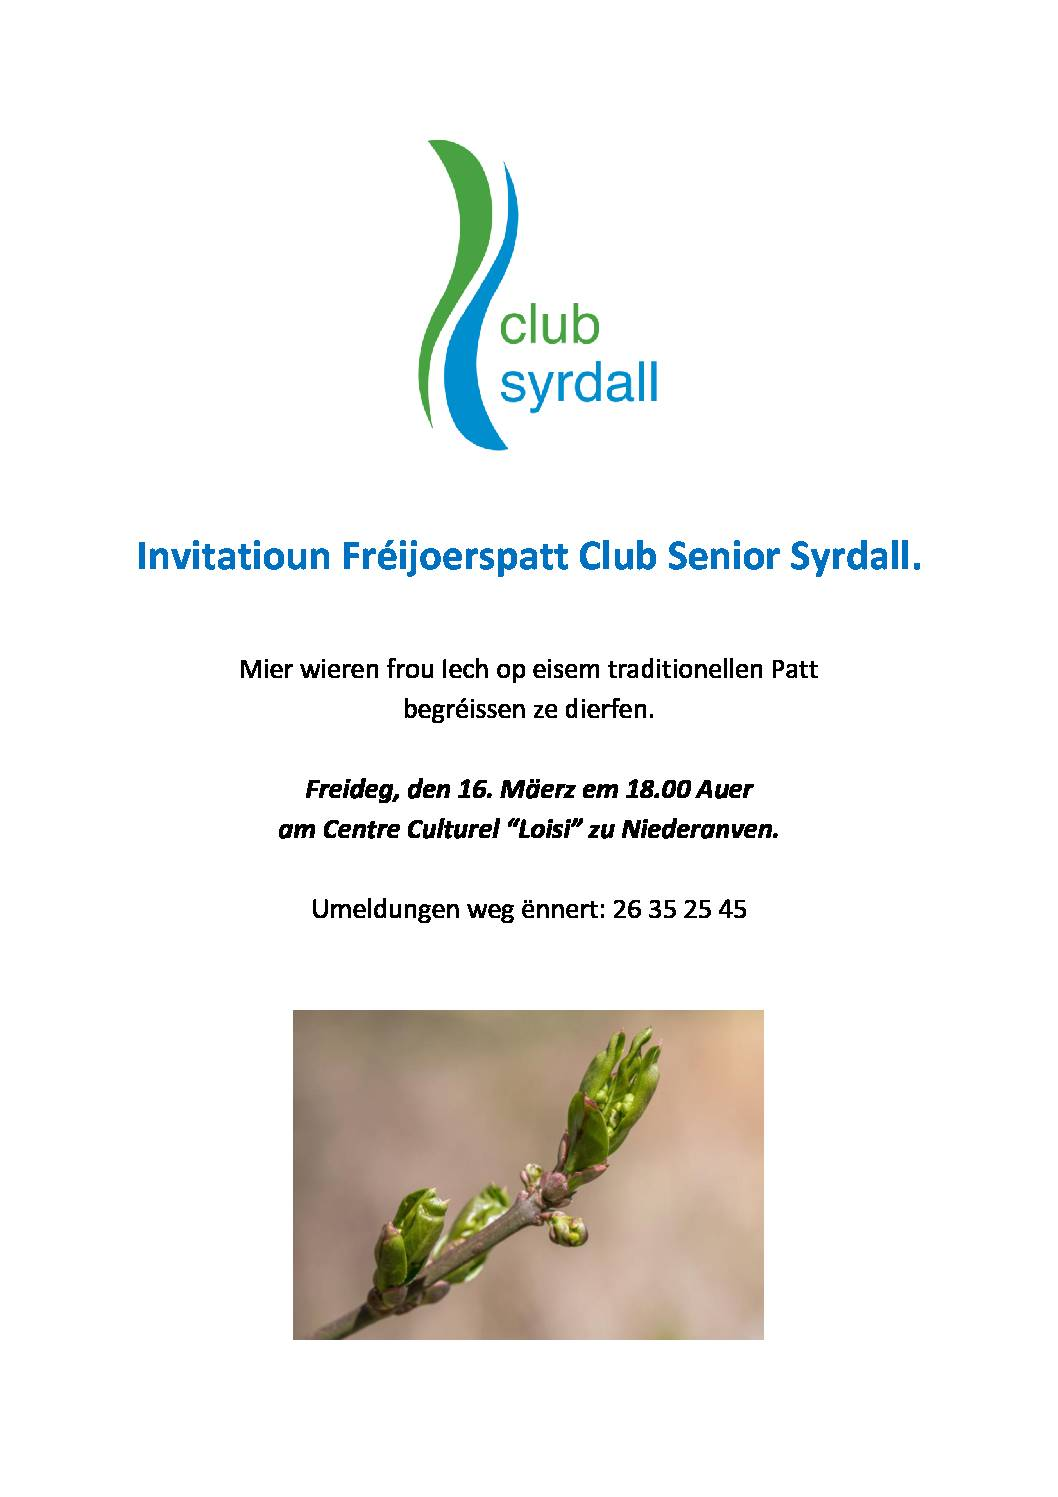 Invitatioun Fréijoerspatt Club Senior Syrdall